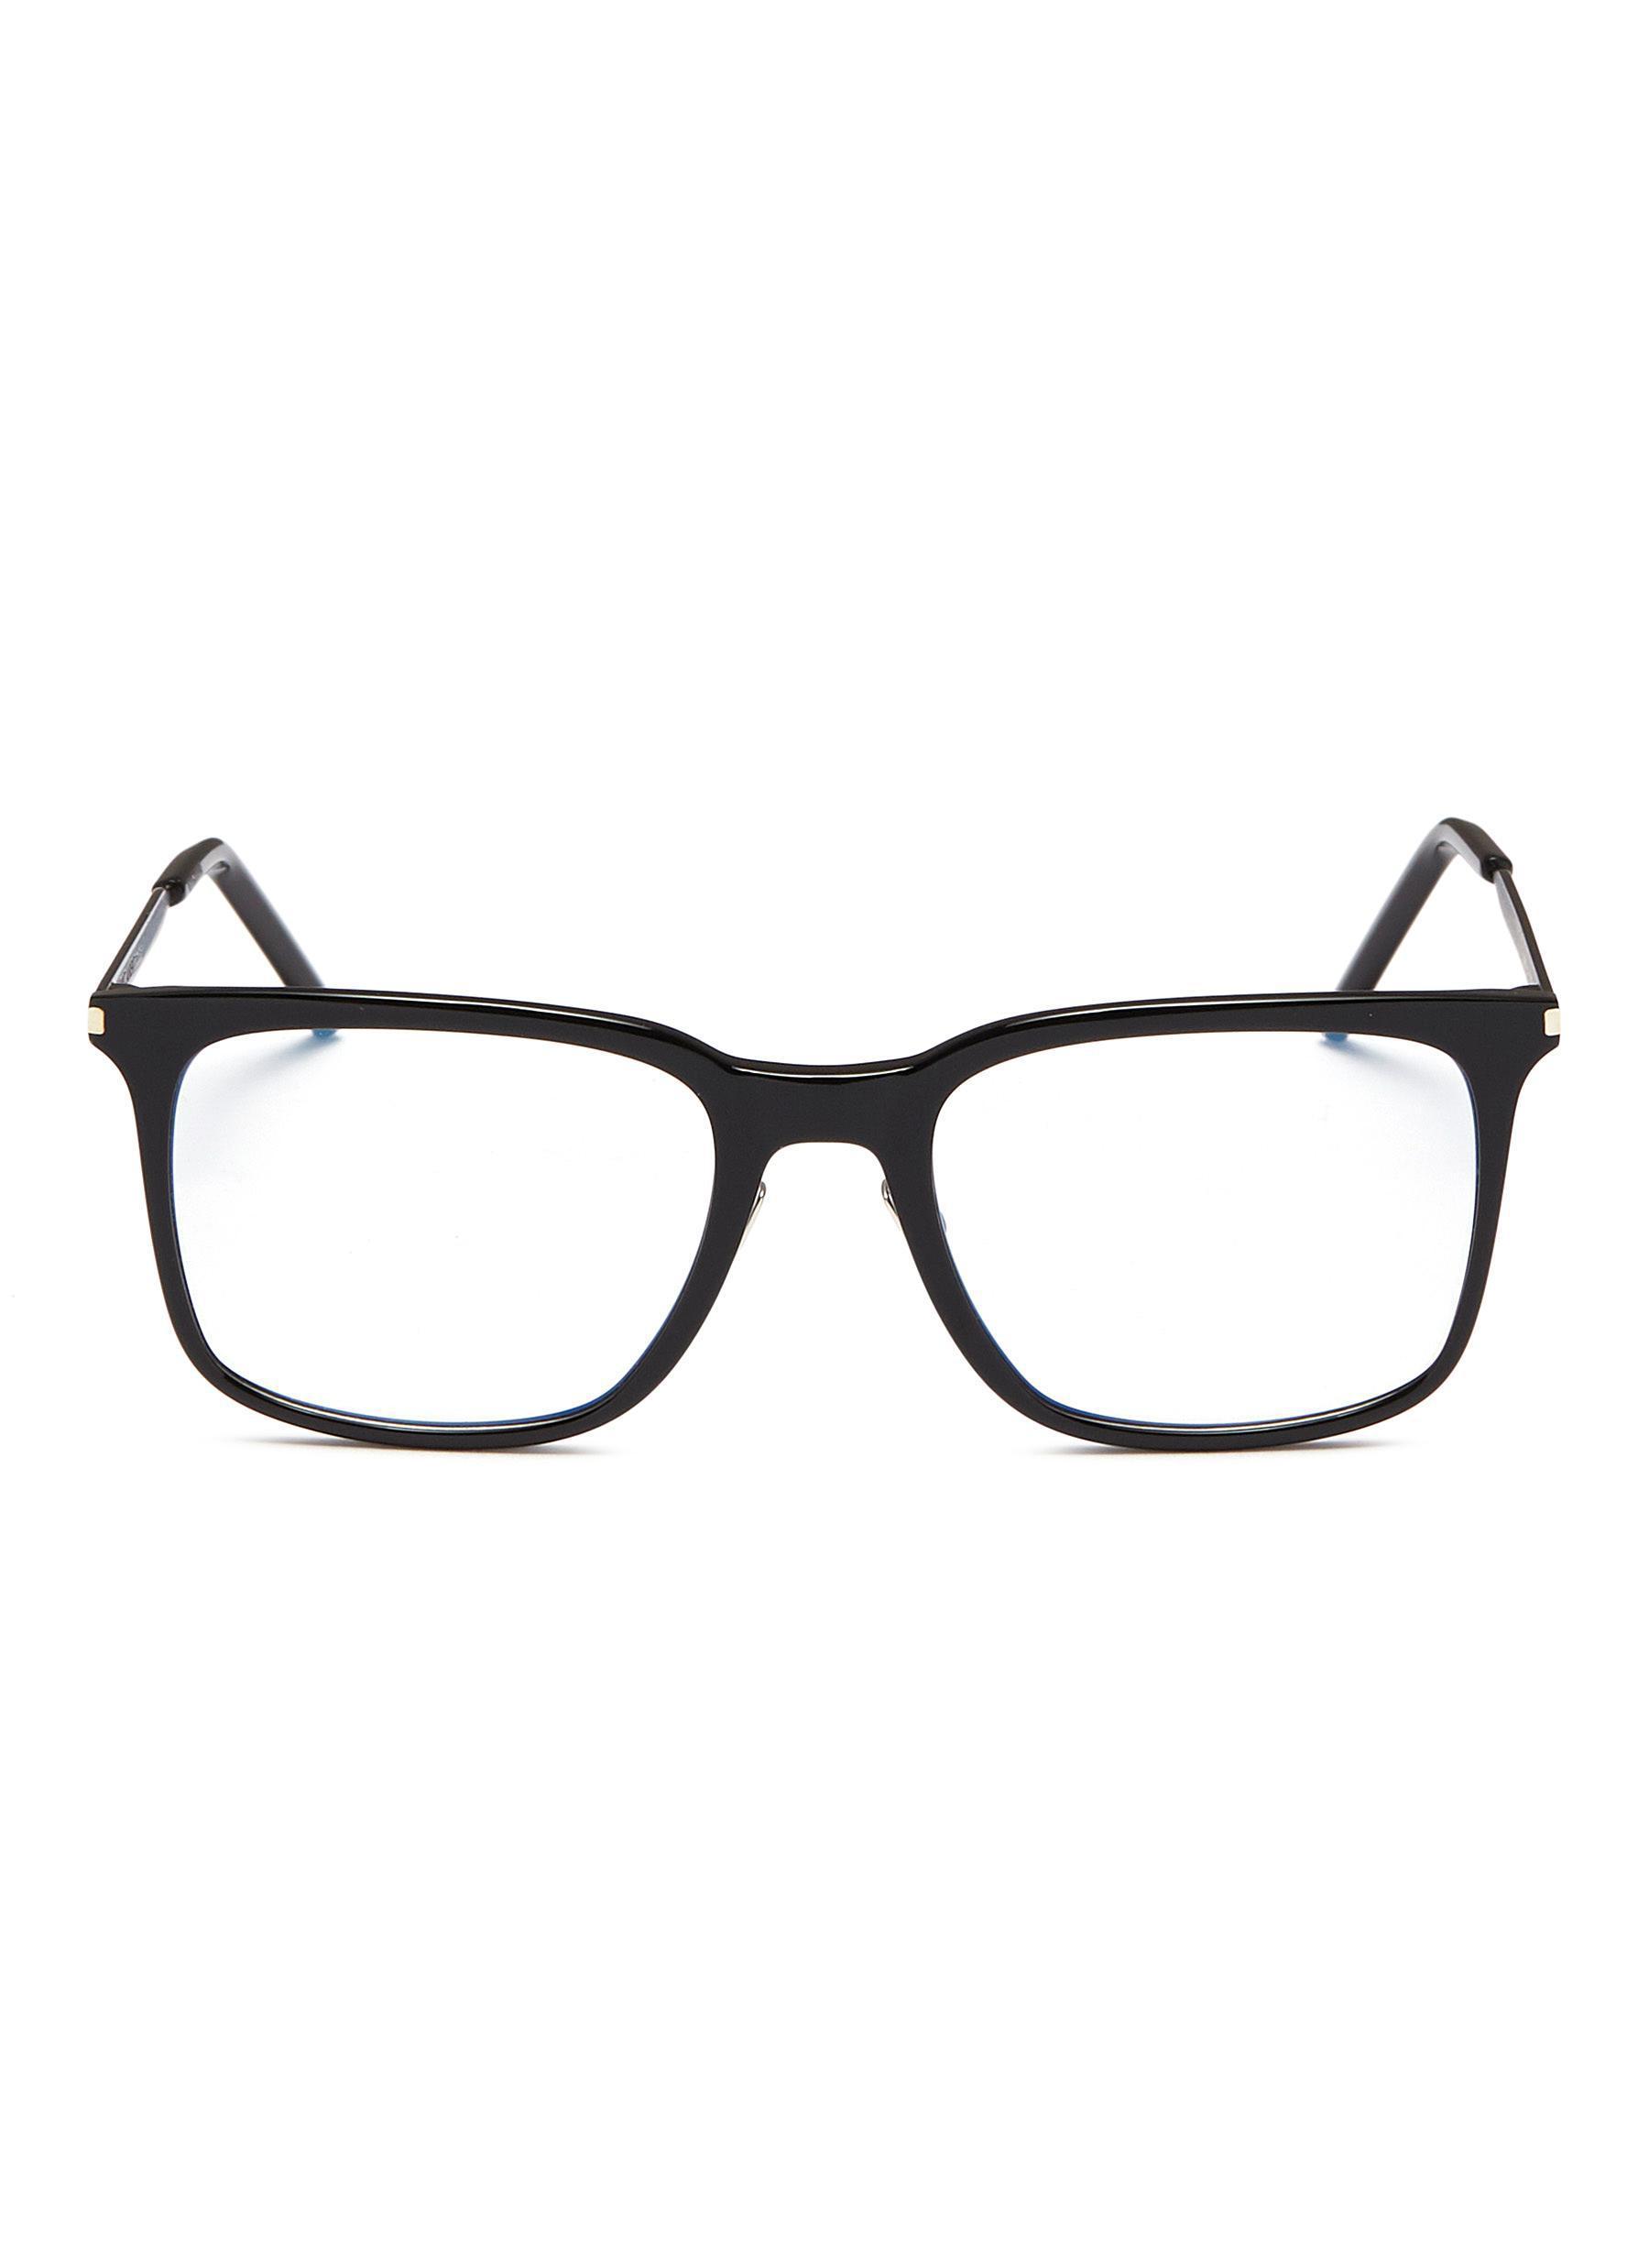 f533848b20 Saint Laurent Metal Temple Acetate Square Optical Glasses in Black ...